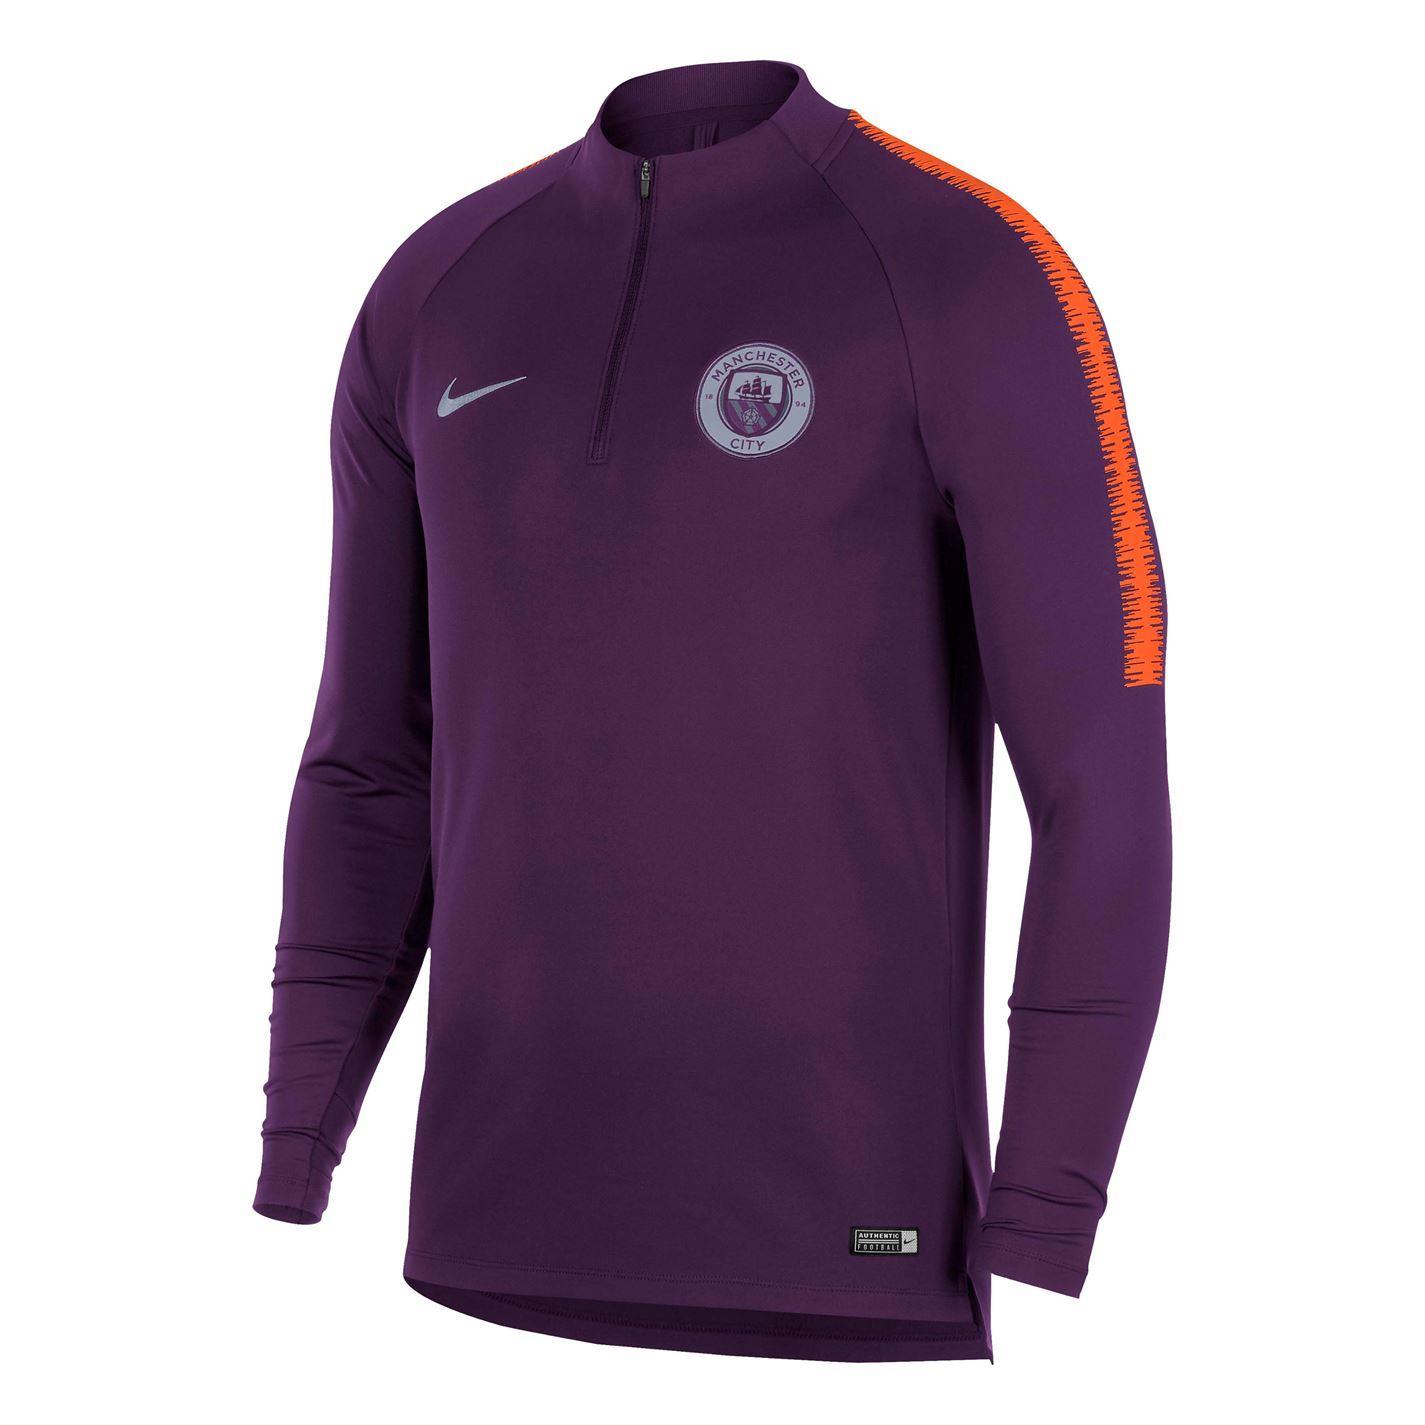 514a89cf562 ... Nike Manchester City Squad Drill Top 2018 2019 Mens Football Soccer  Sweatshirt ...